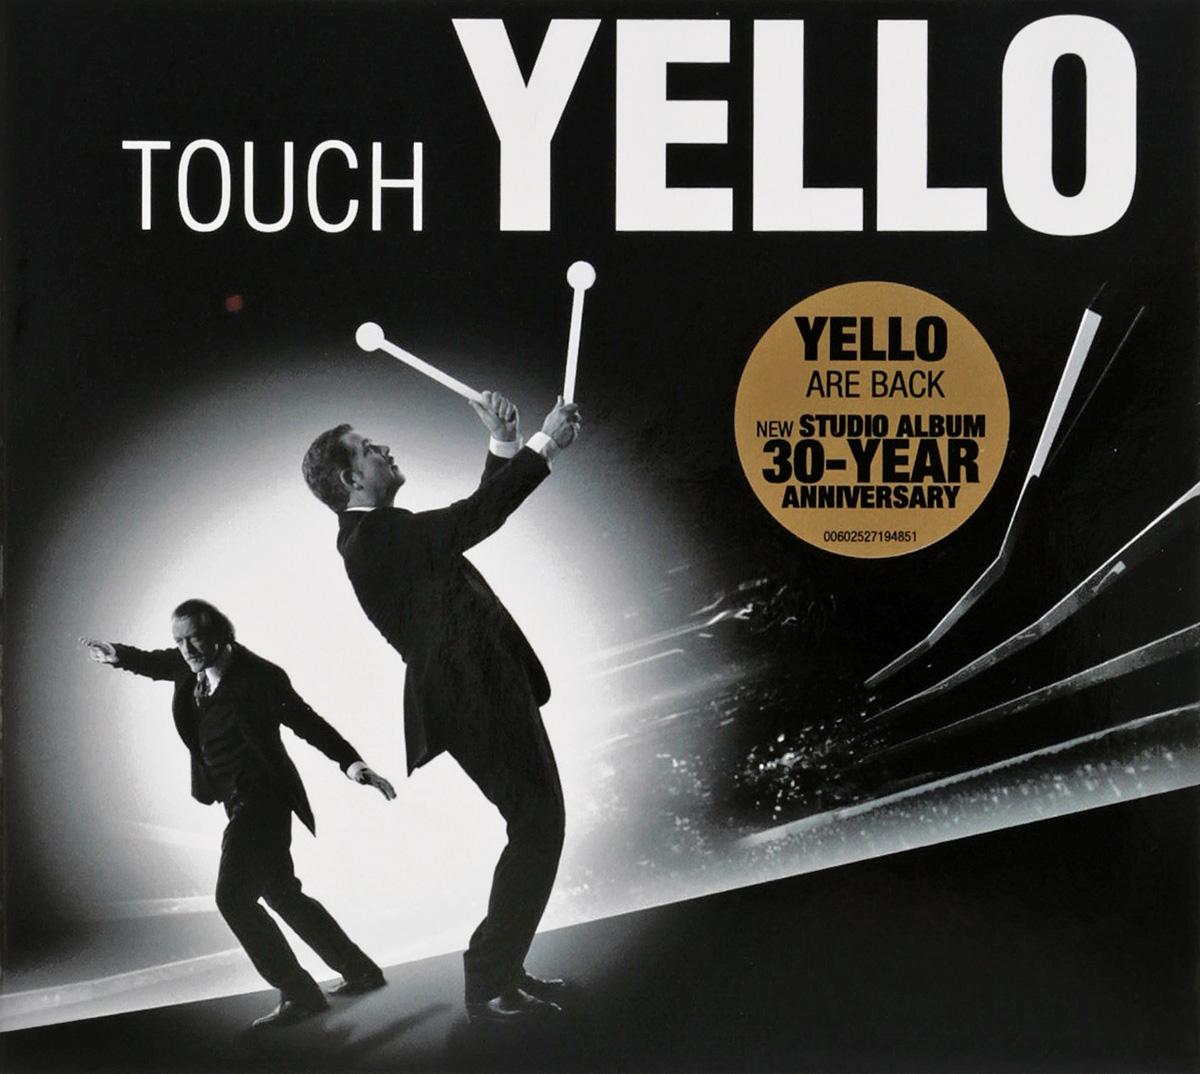 Yello. Touch Yello